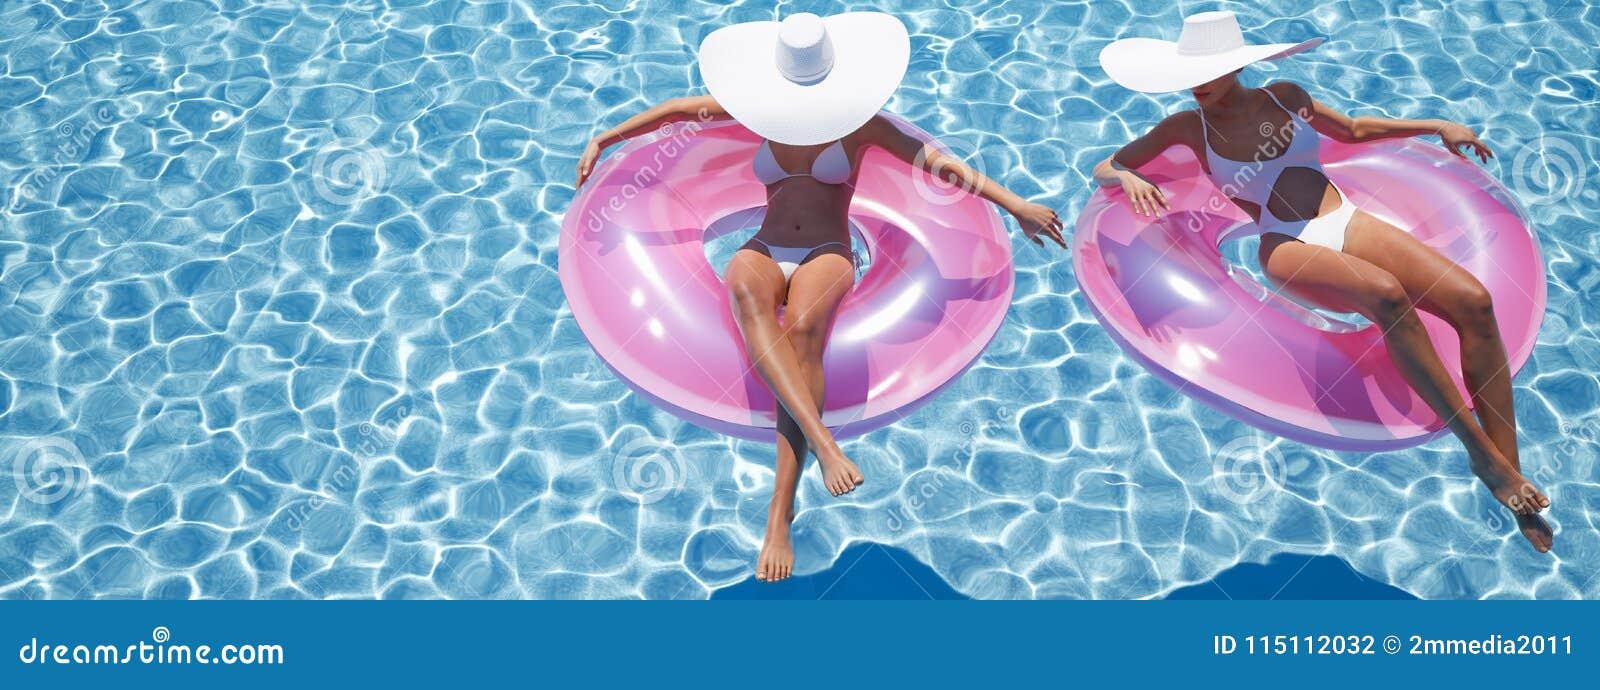 Women swimming on float in a pool. 3d rendering